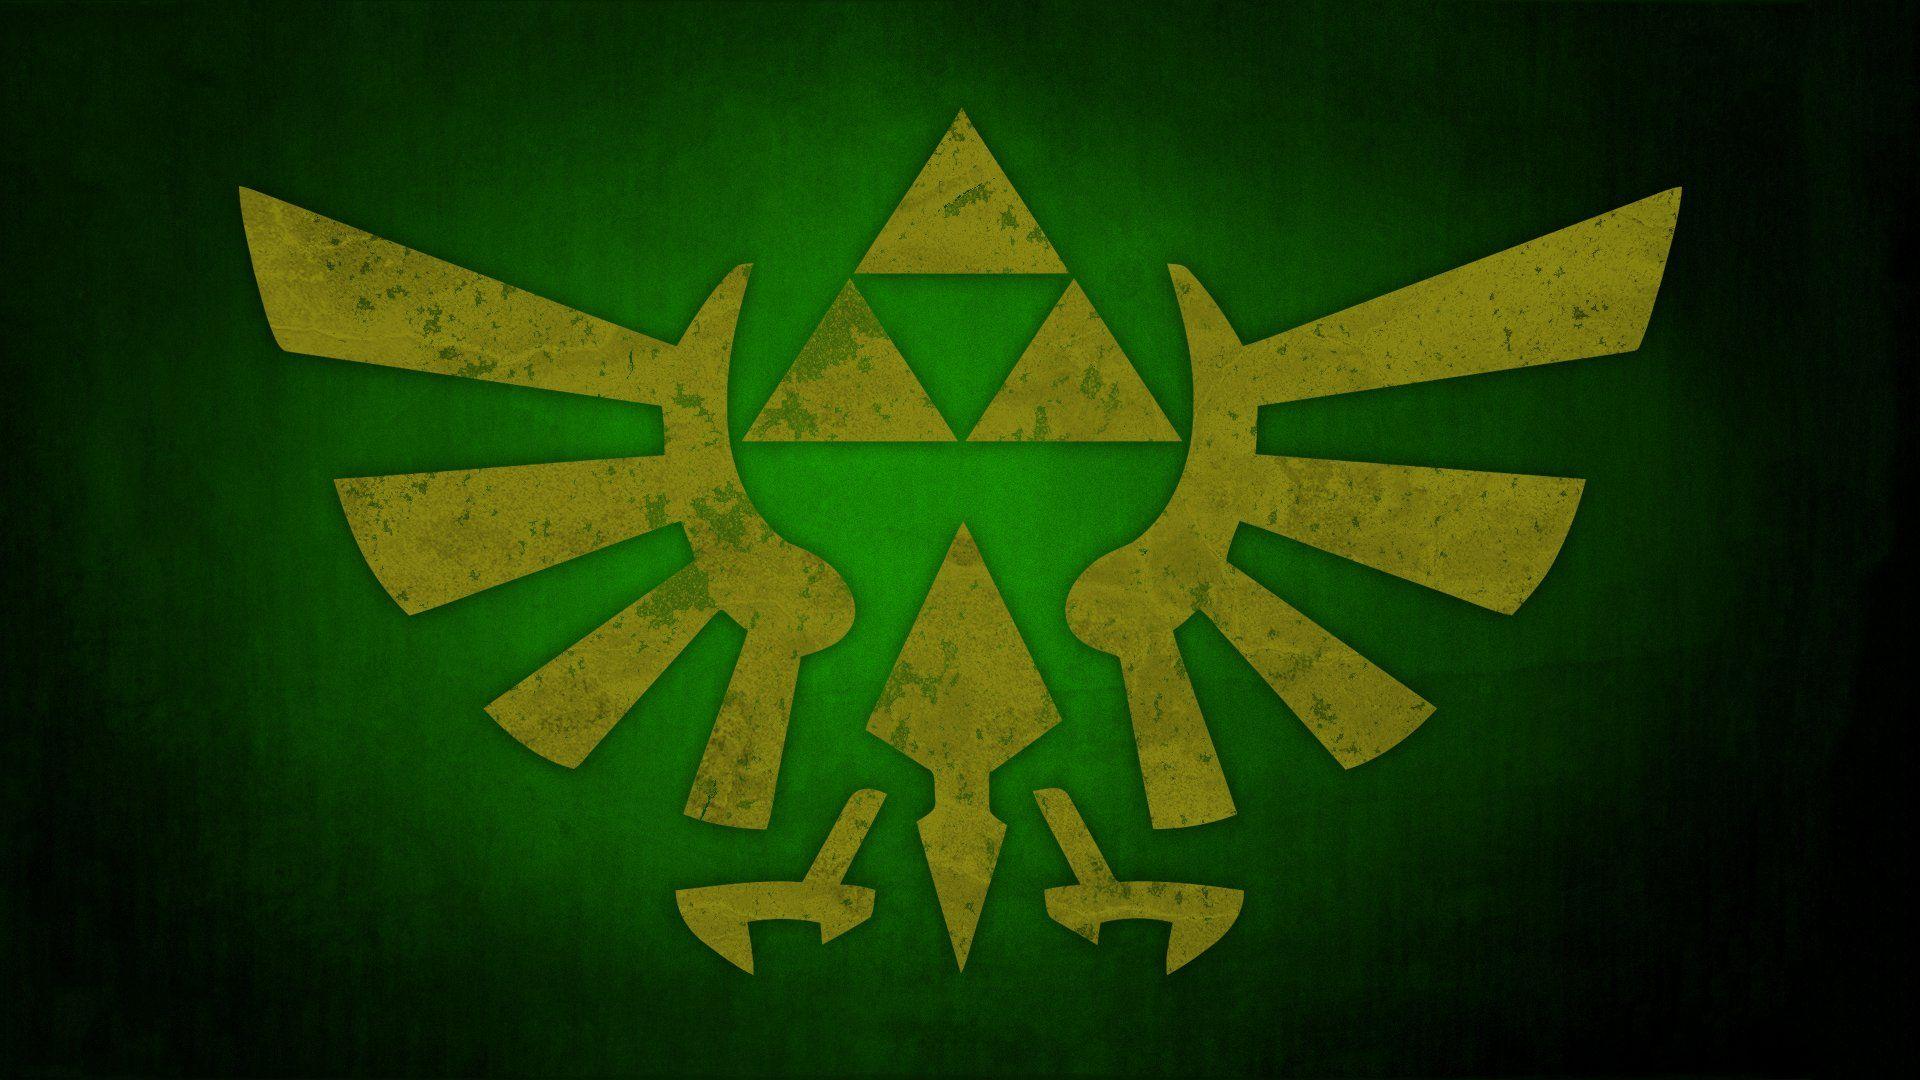 Hyrule Crest Wallpaper